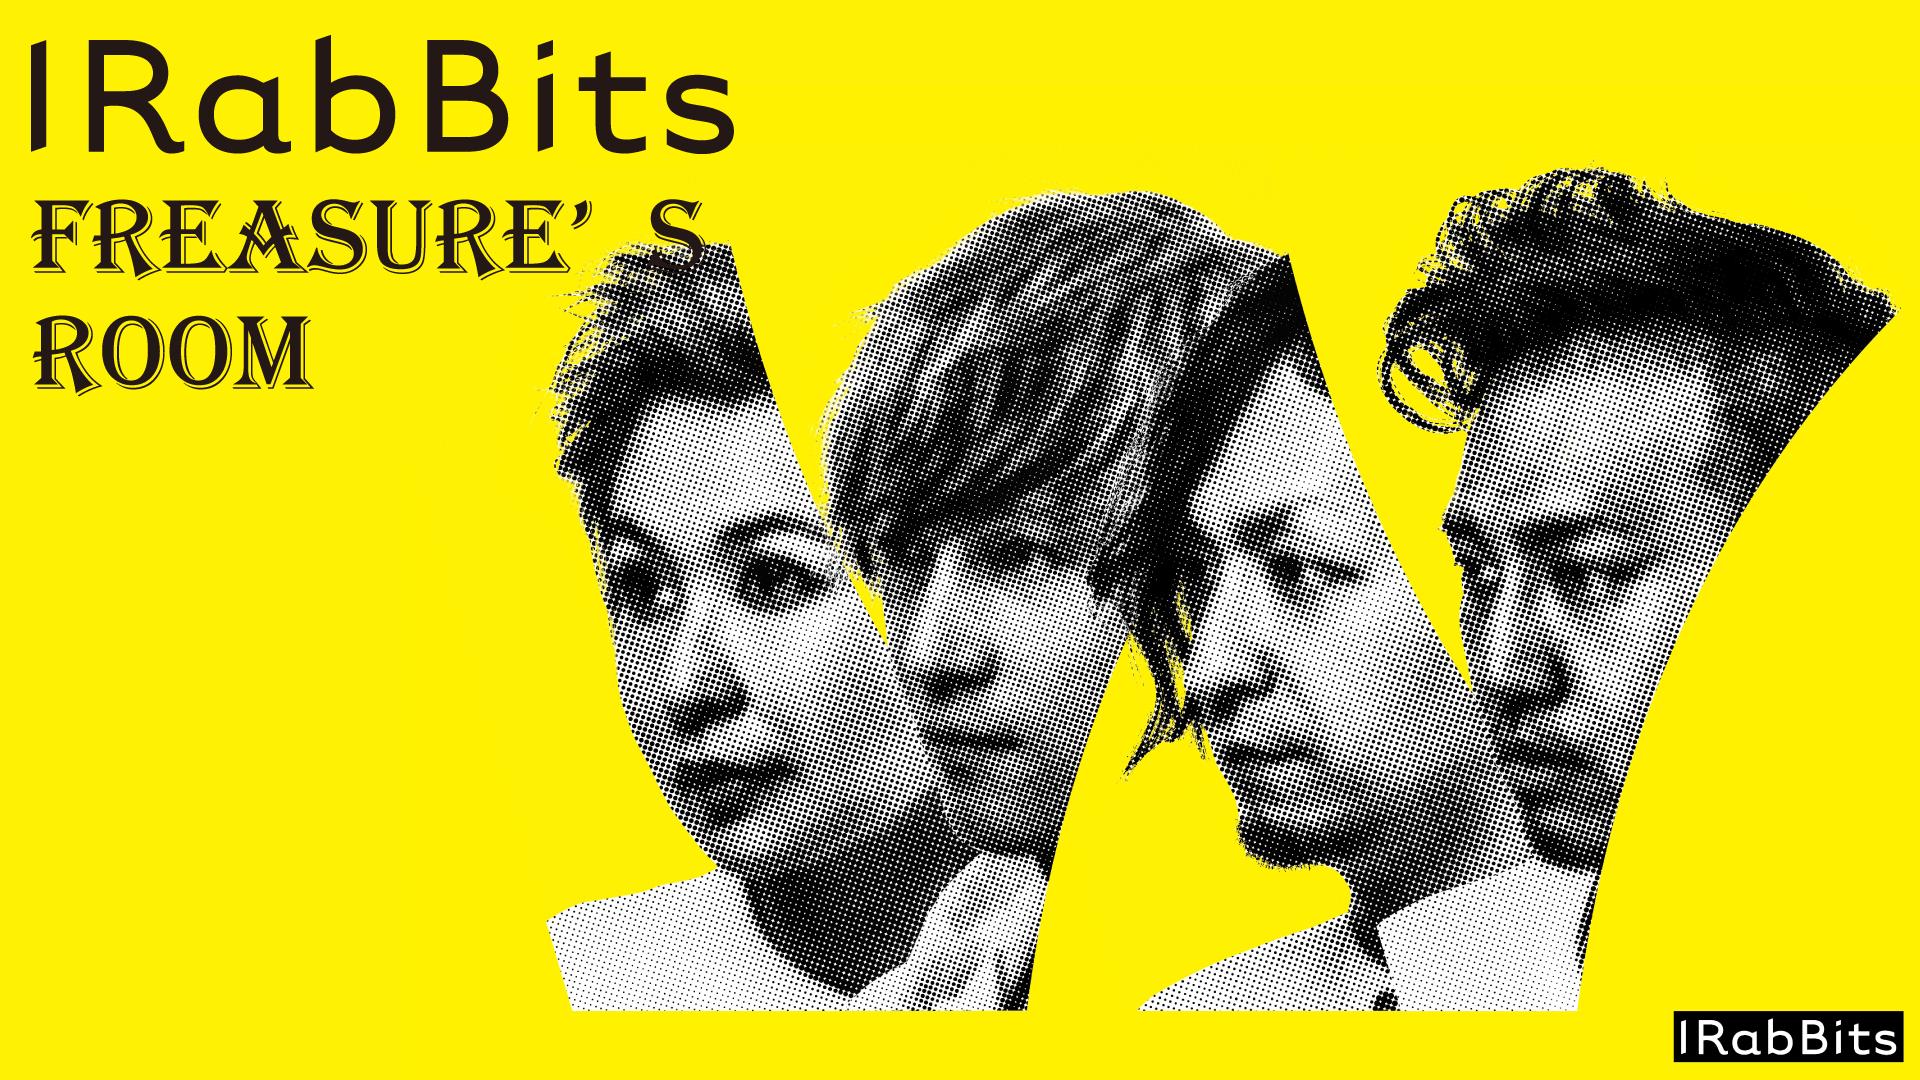 IRabBits FREASURE'S ROOM